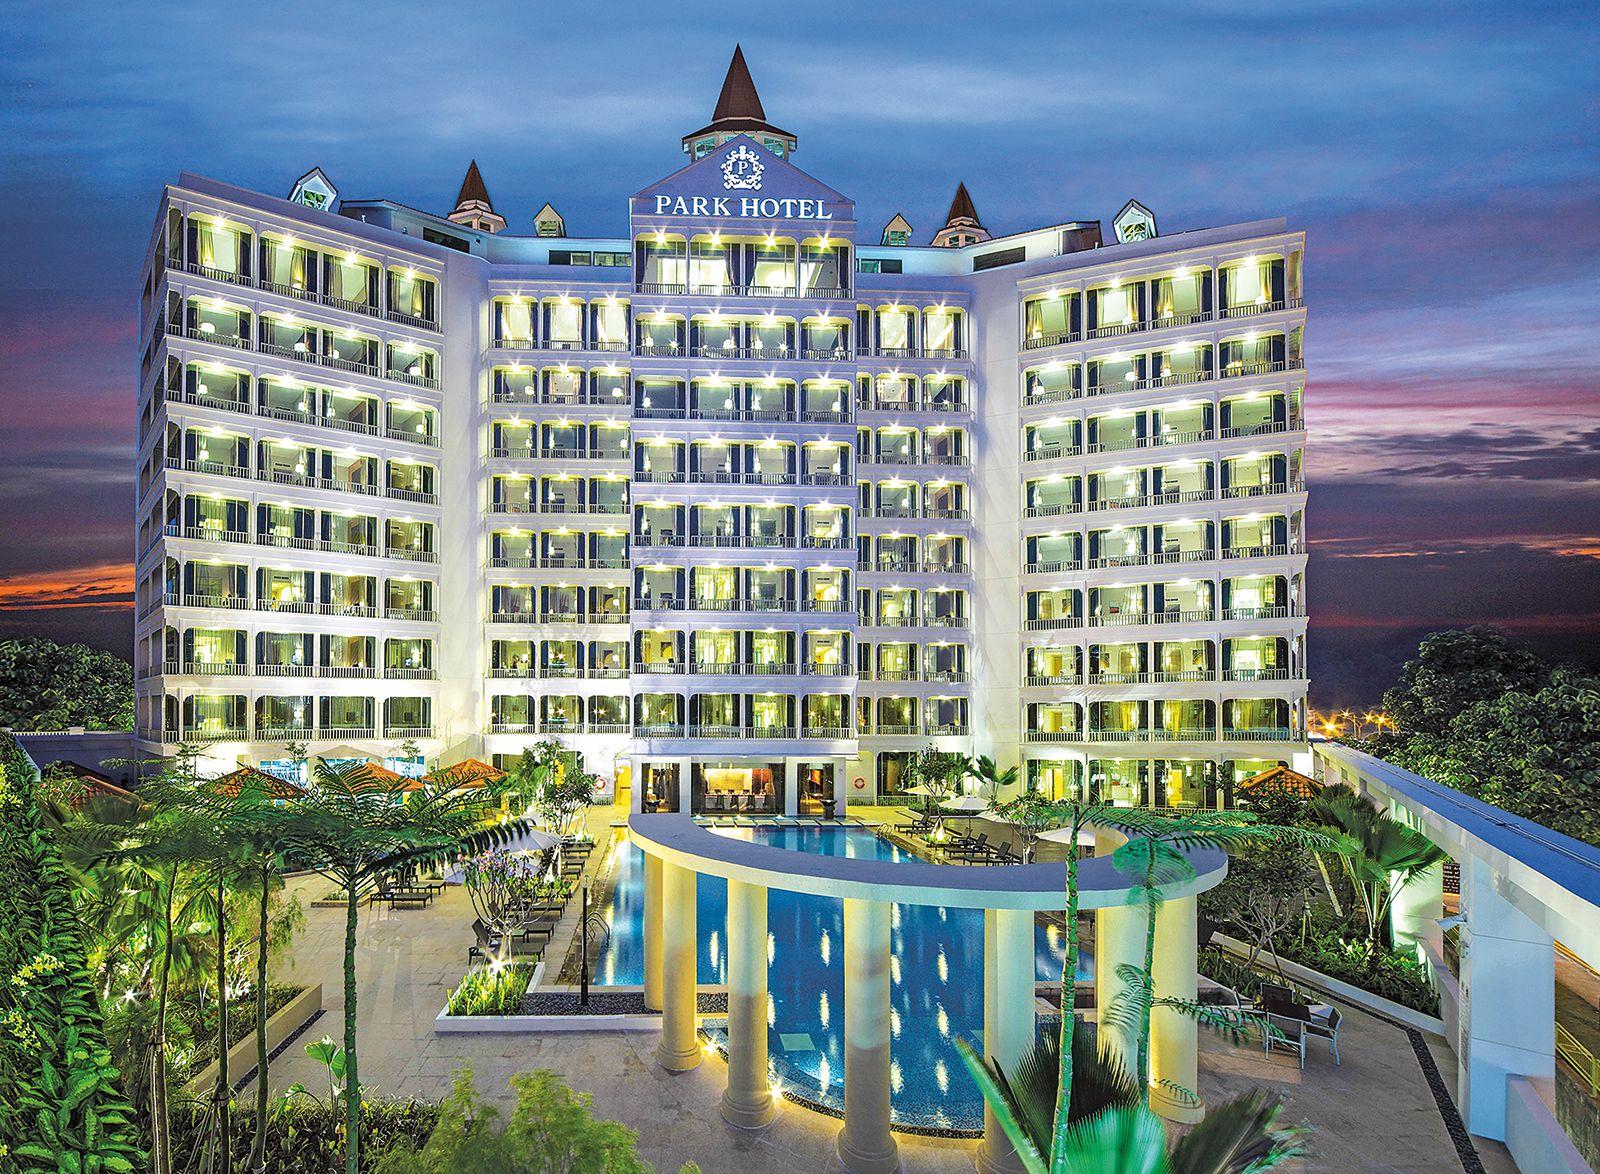 Park Hotel Clarke Quay Singapur